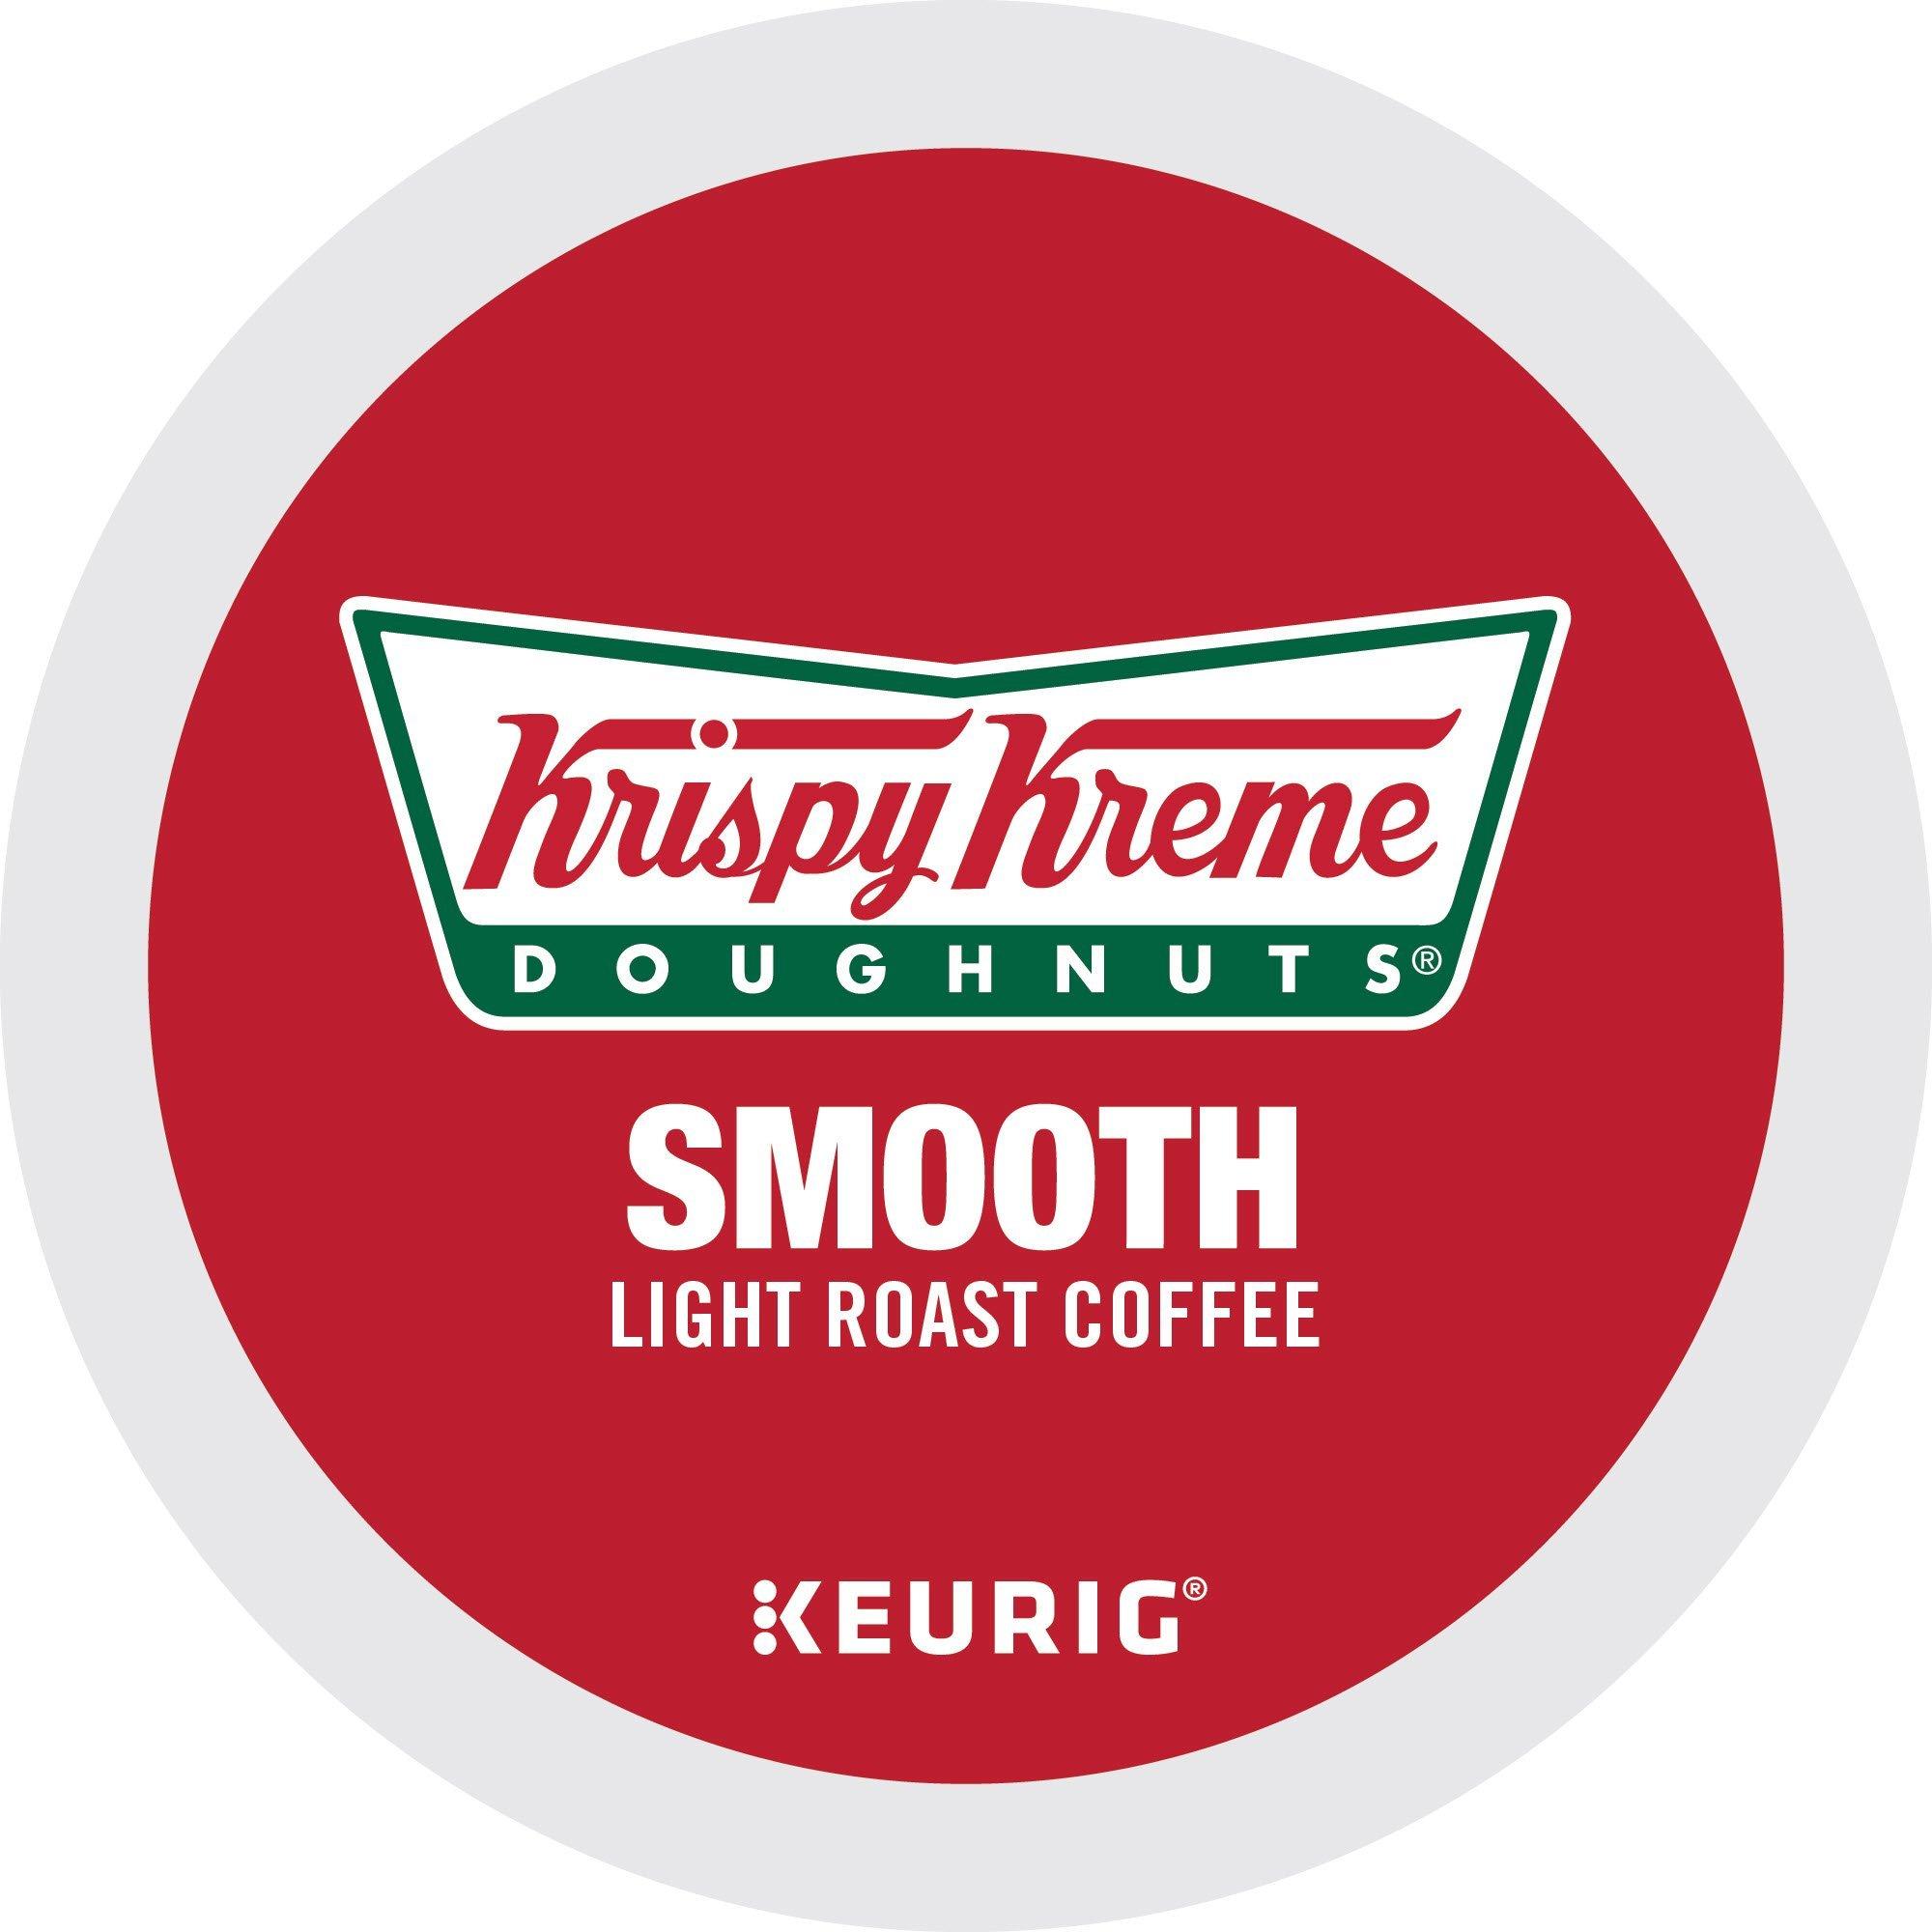 Krispy Kreme Keurig Single-Serve K-Cup Pods, Smooth Light Roast Coffee, 24 Count